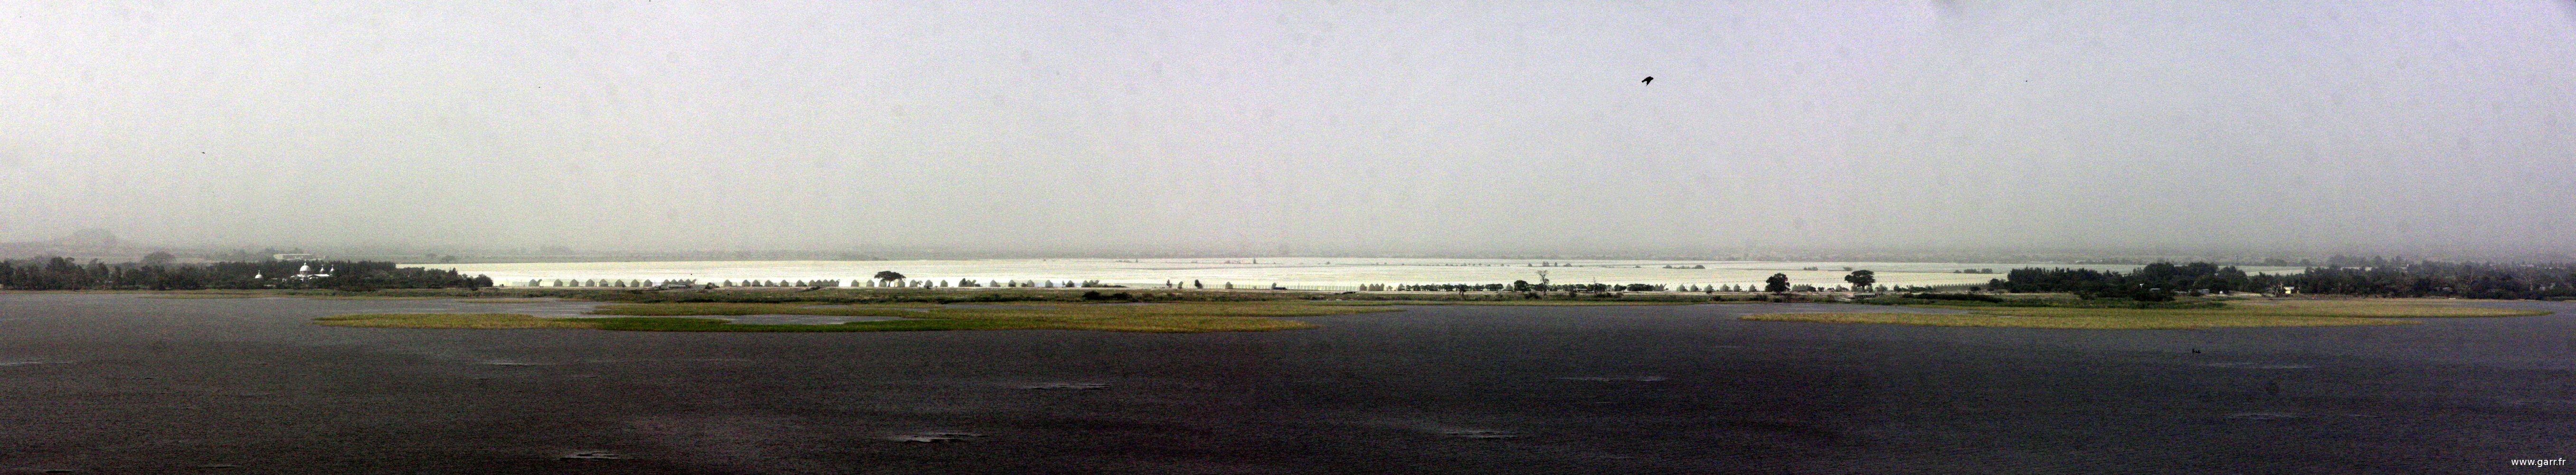 ethiopie-ziway-41-www-garr_-fr_